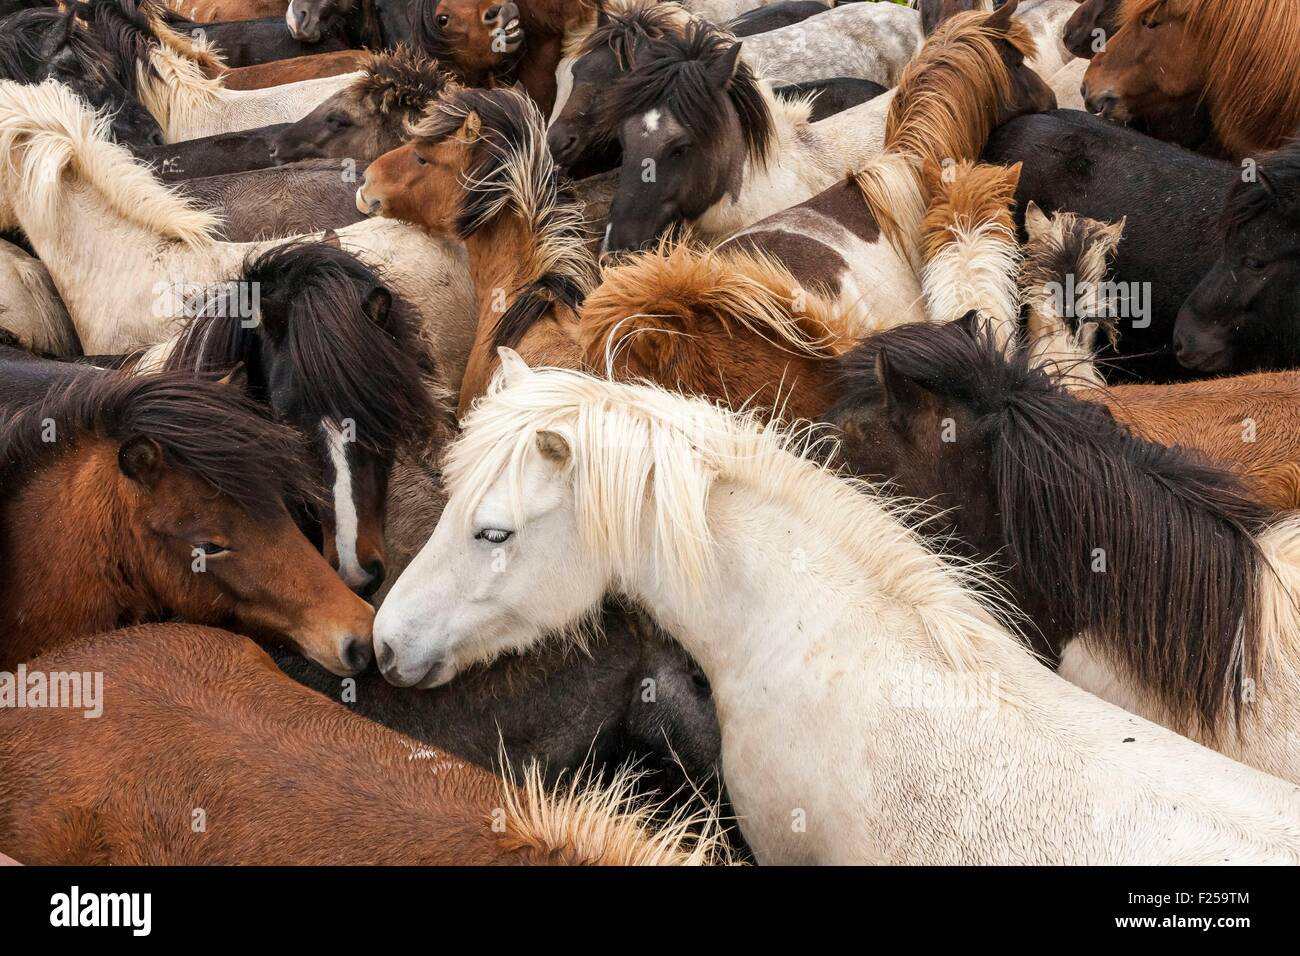 Iceland, Skagi Peninsula, Laxßrdalur Valley near nethrimyrar, Horses grouped in the corral, tight shot, Fall - Stock Image